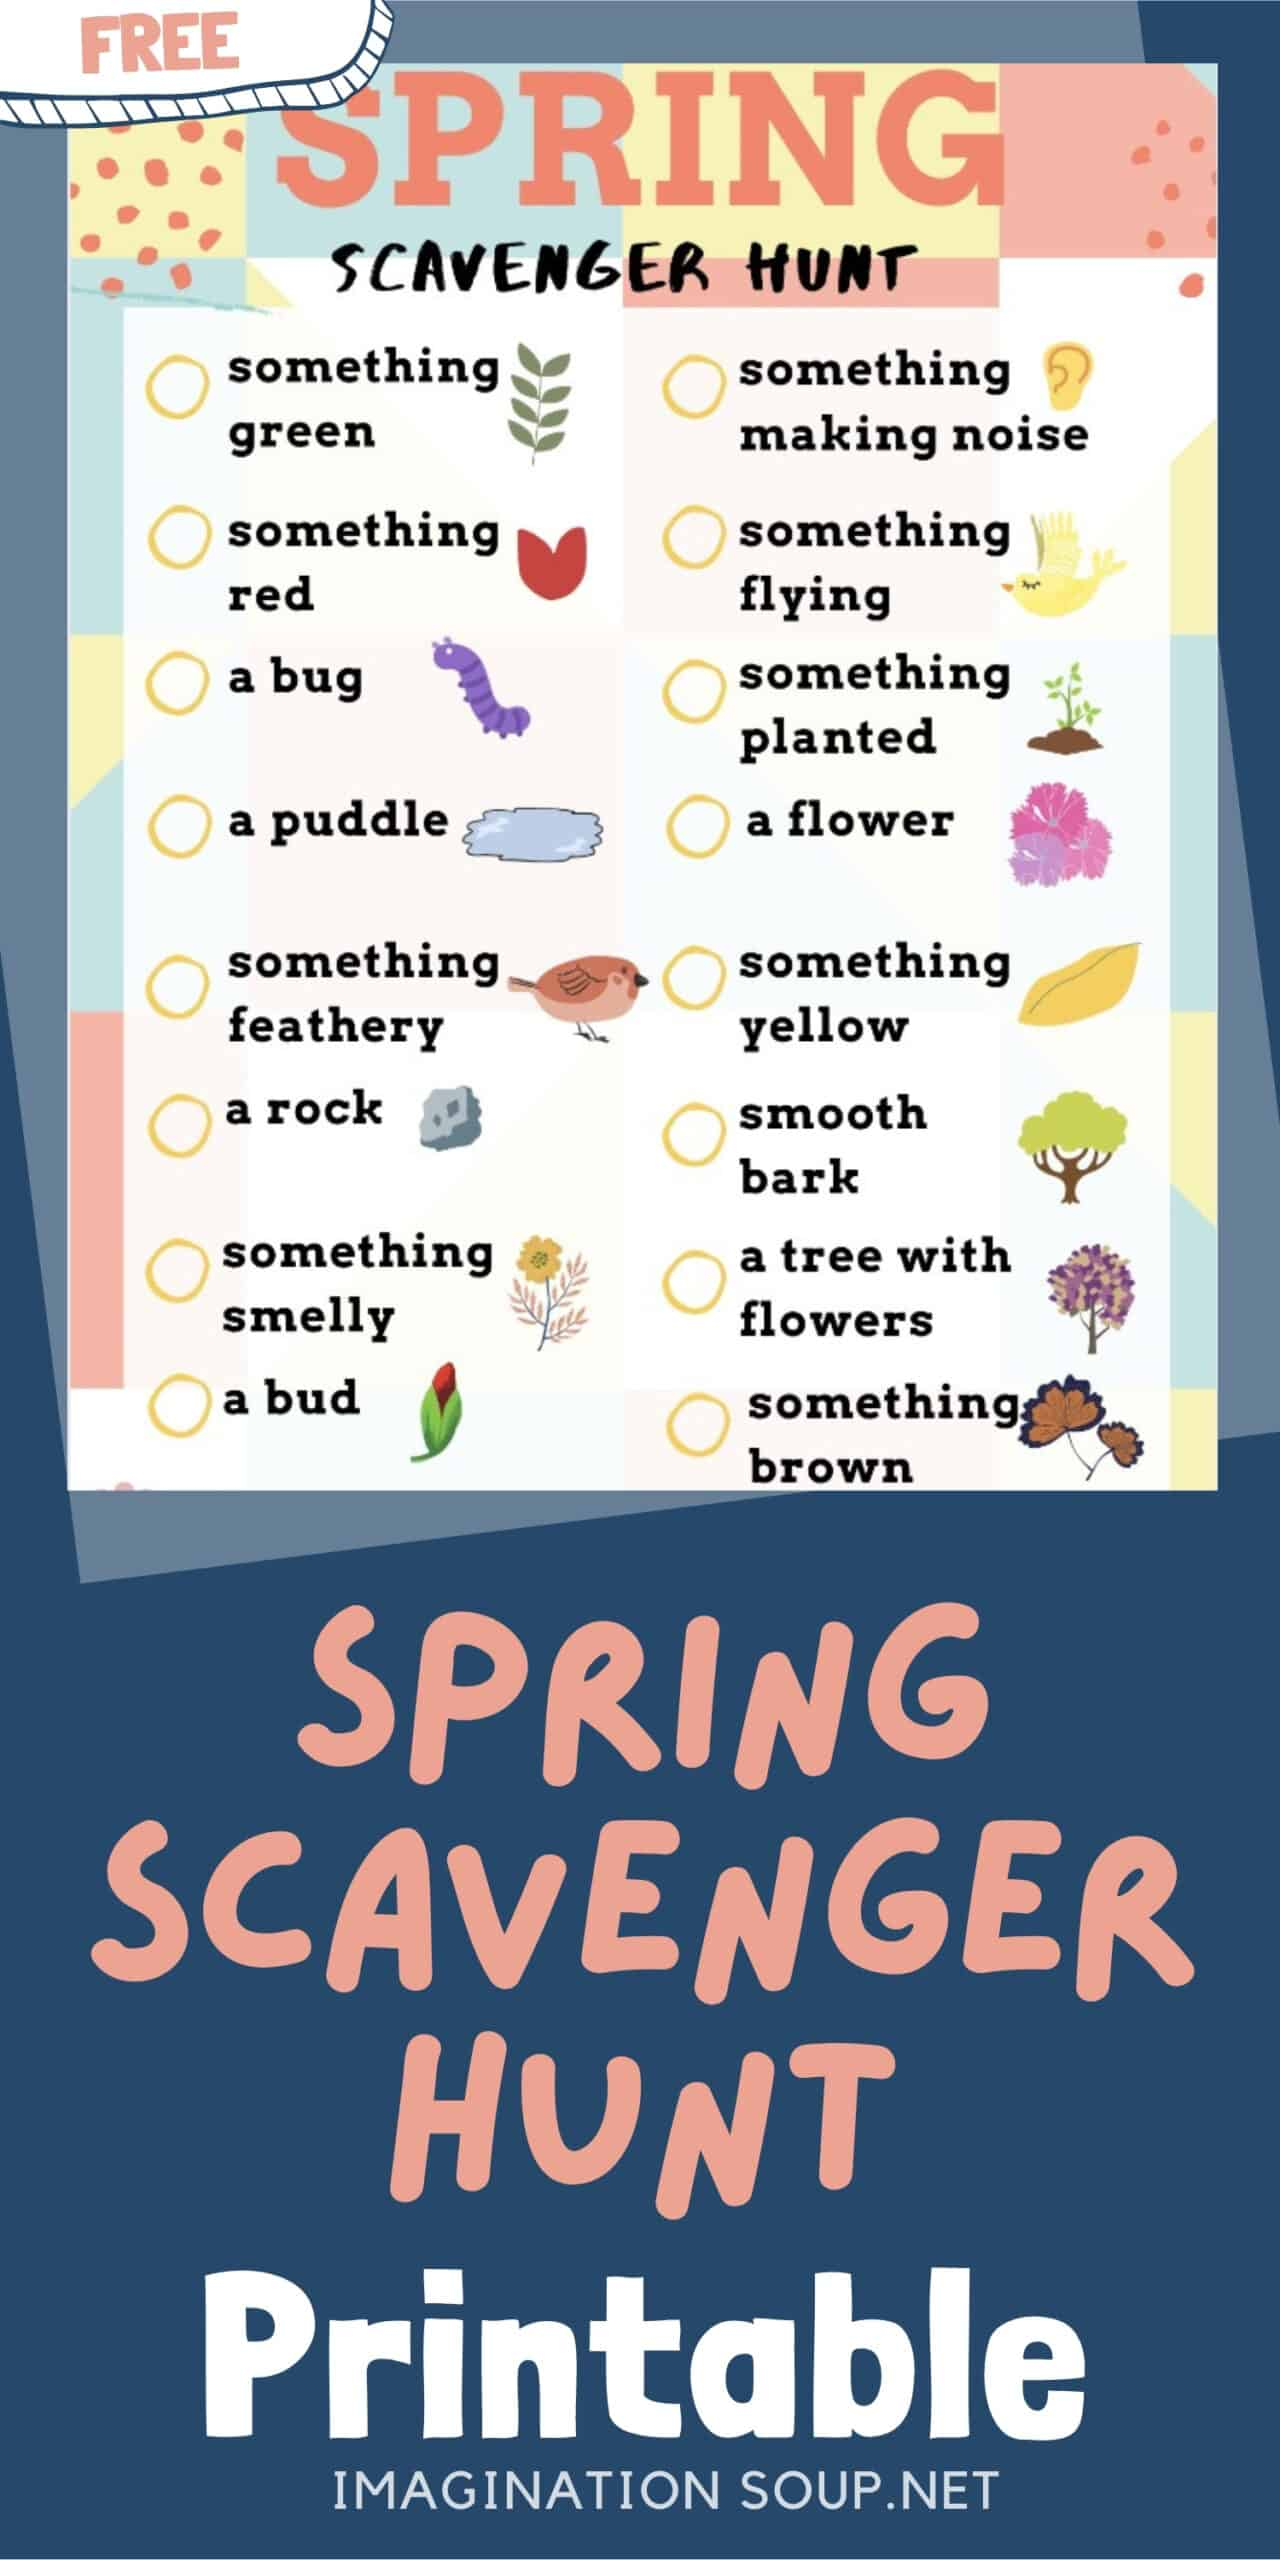 Spring Scavenger Hunt FREE PRINTABLE